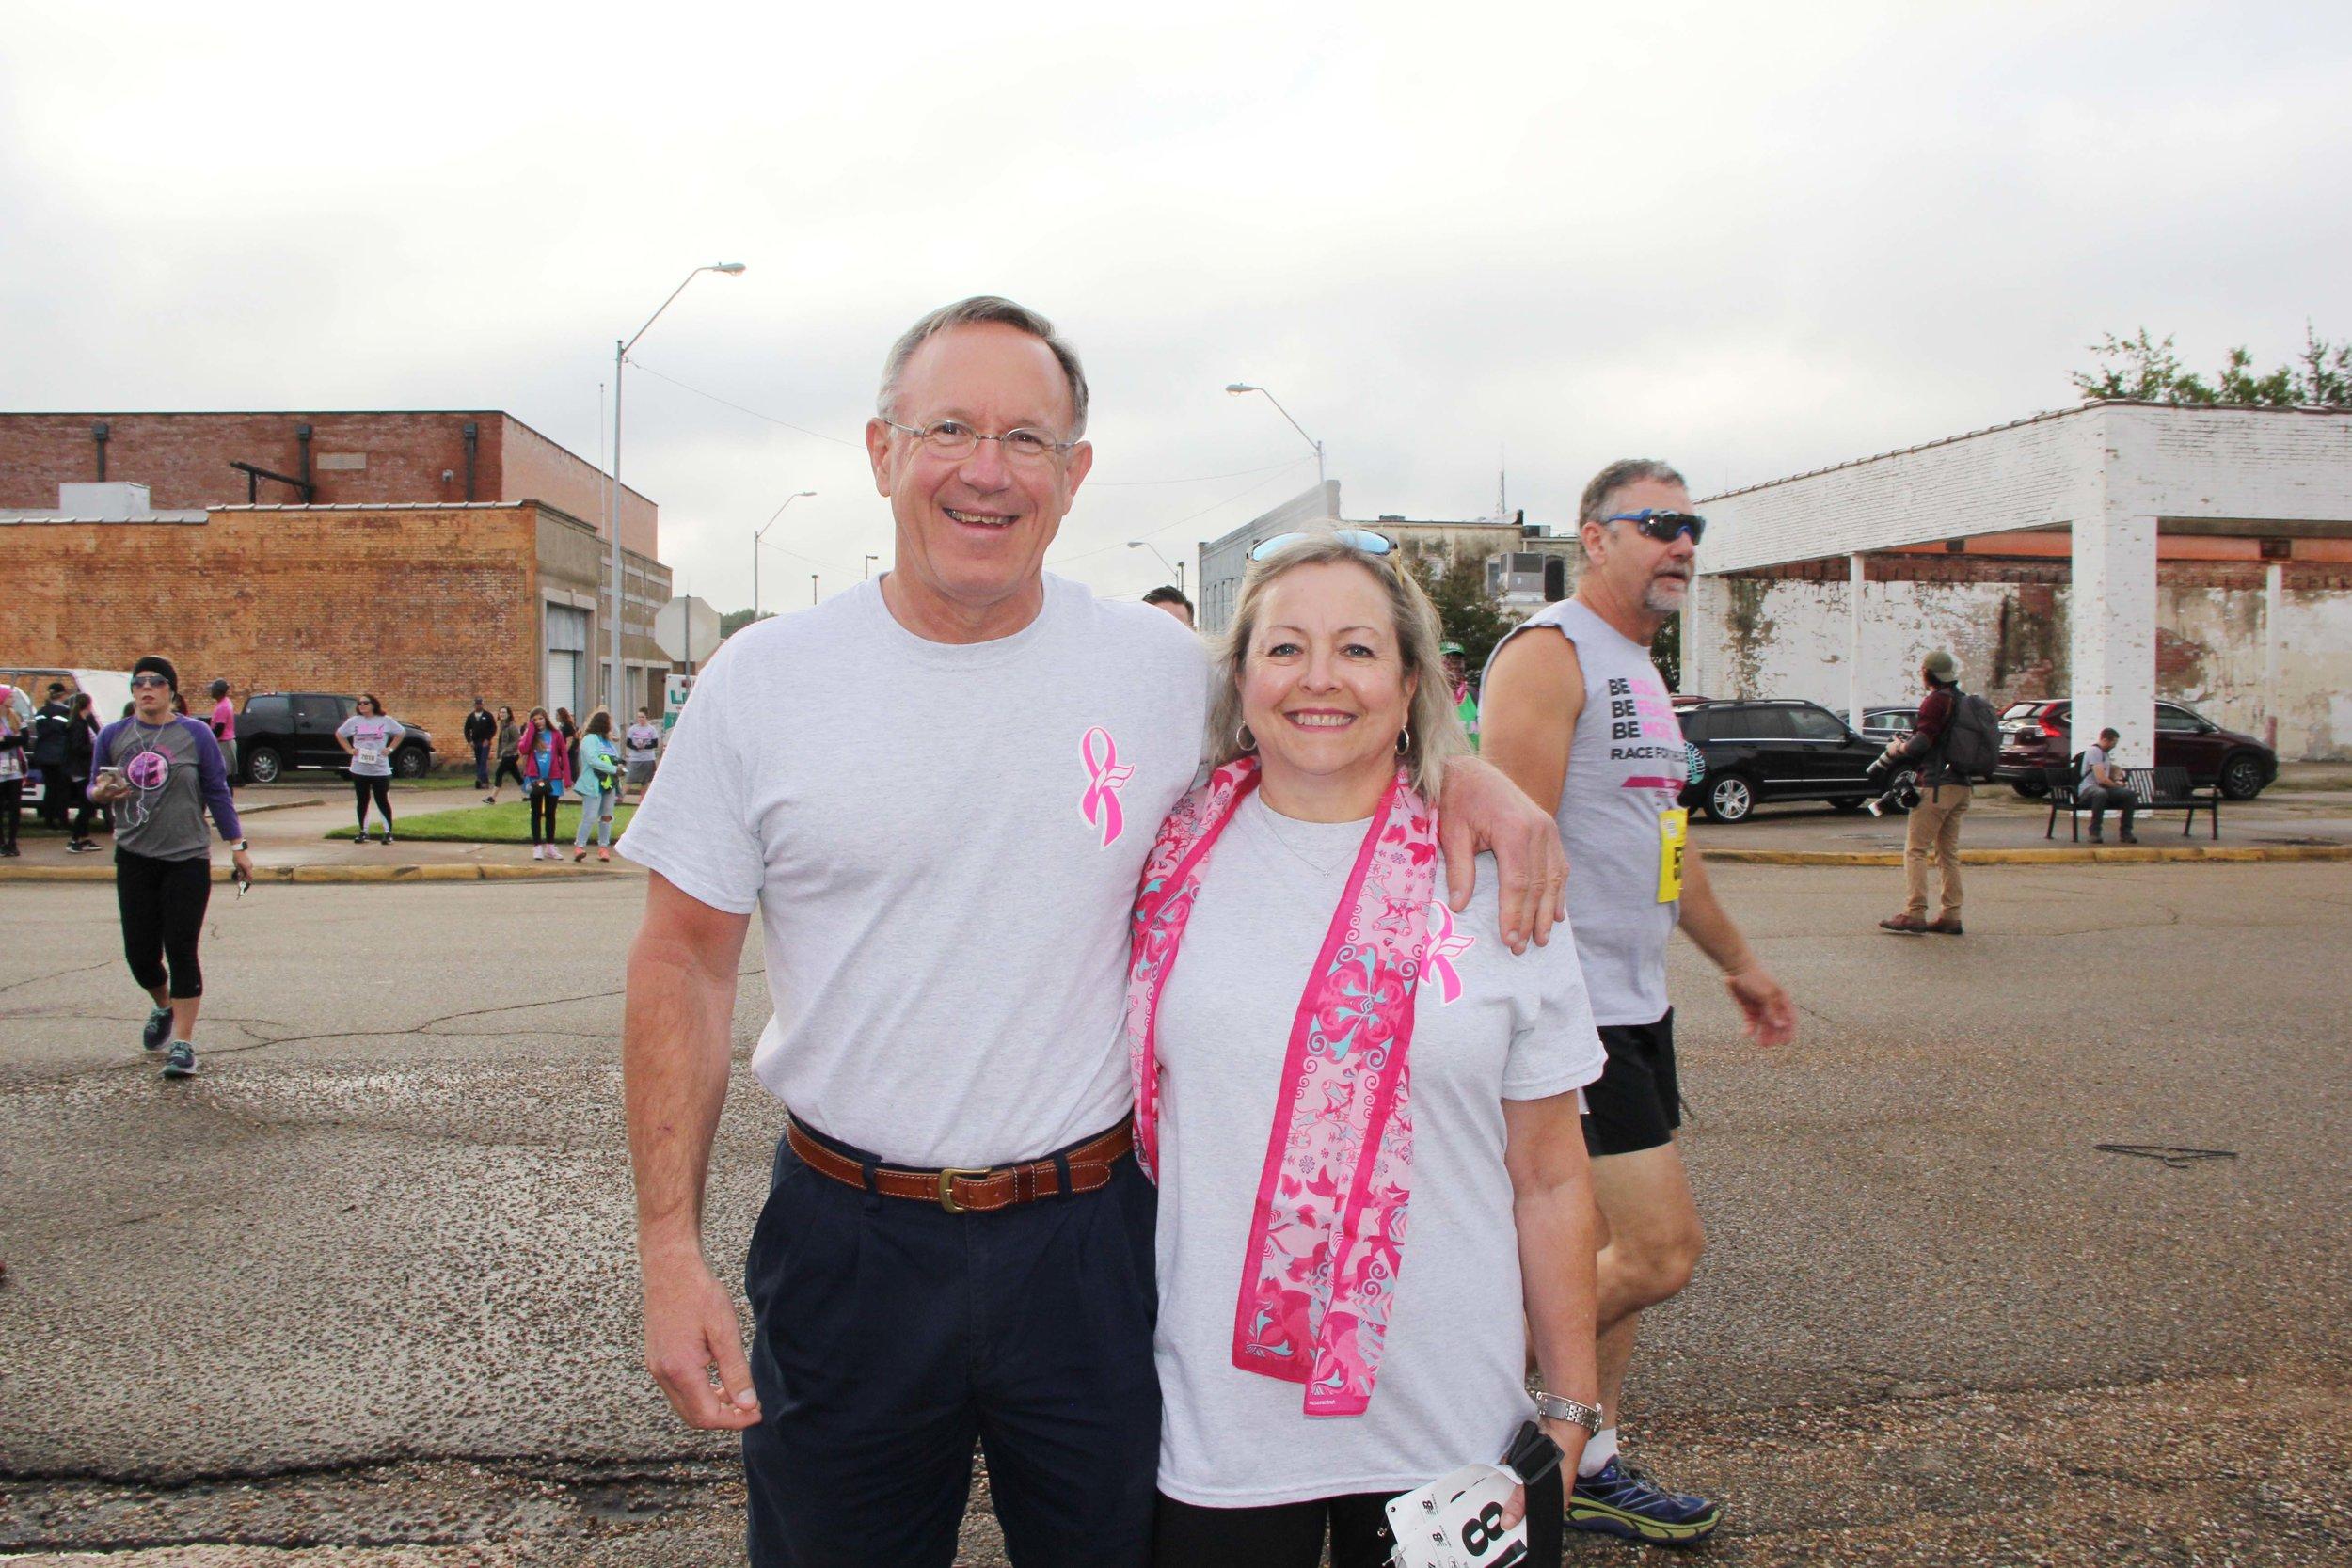 James and Kathy Bramlett